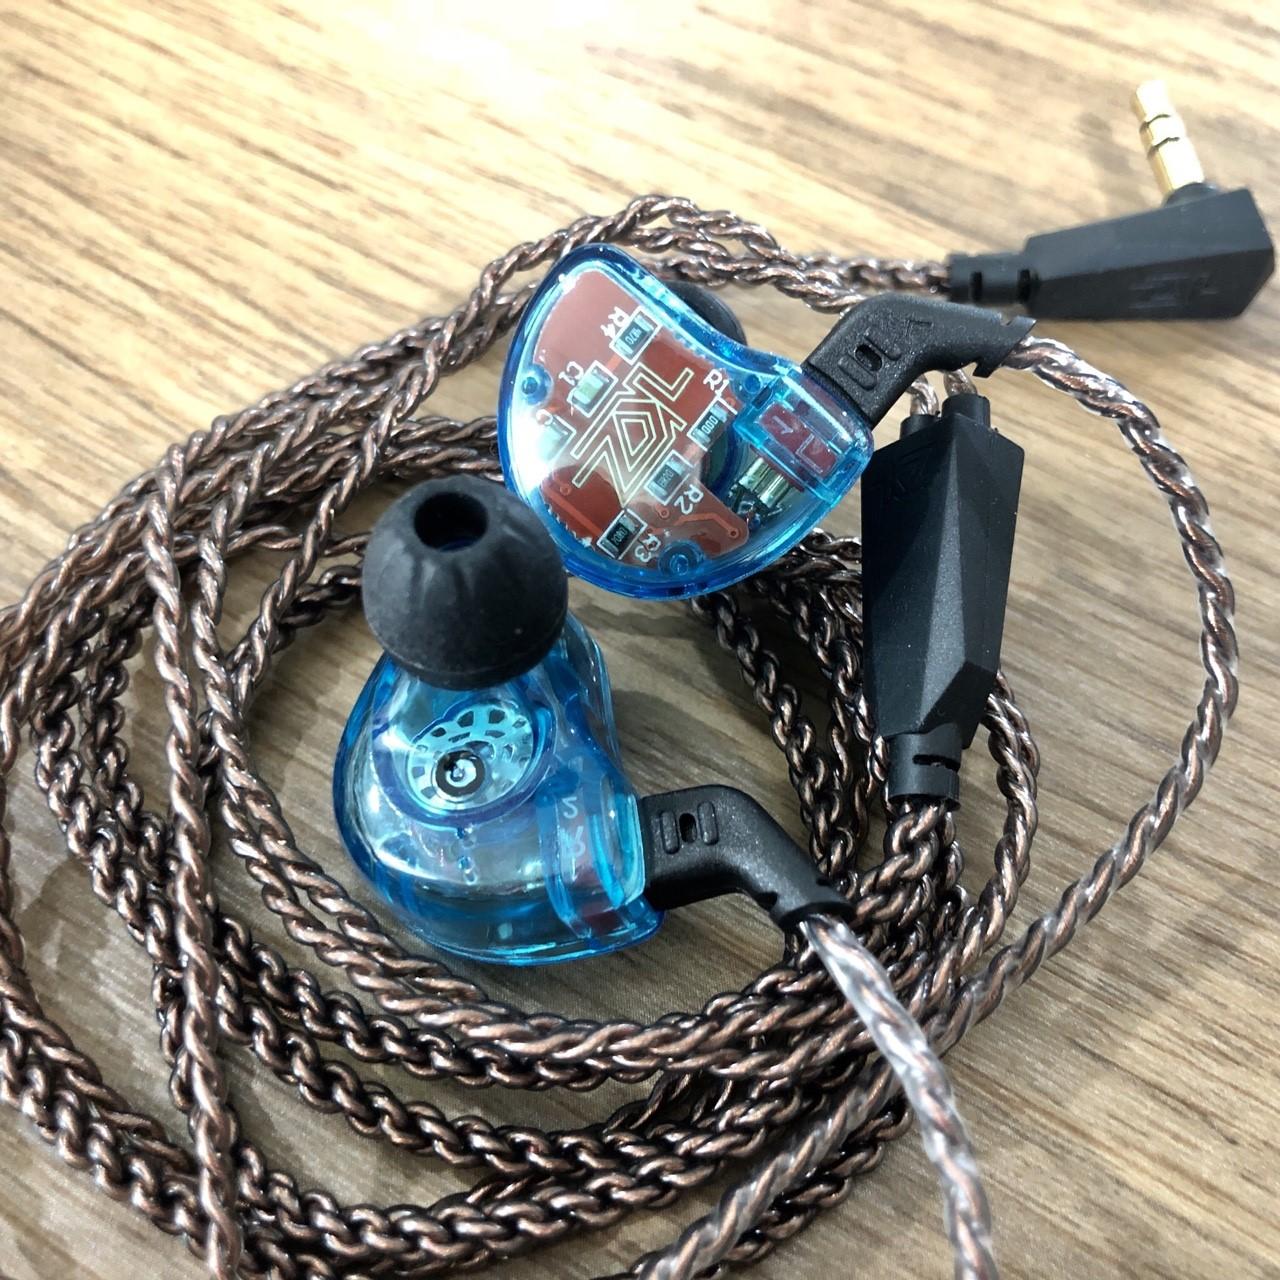 KZ รุ่น ZS10 สีฟ้า (มีไมค์ ) หูฟัง Hybrid 5 ไดร์เวอร์ ถอดเปลี่ยนสายได้ ประกัน 6 เดือน รูปทรง in ear monitor (IEM) เสียงดี มิติครบ